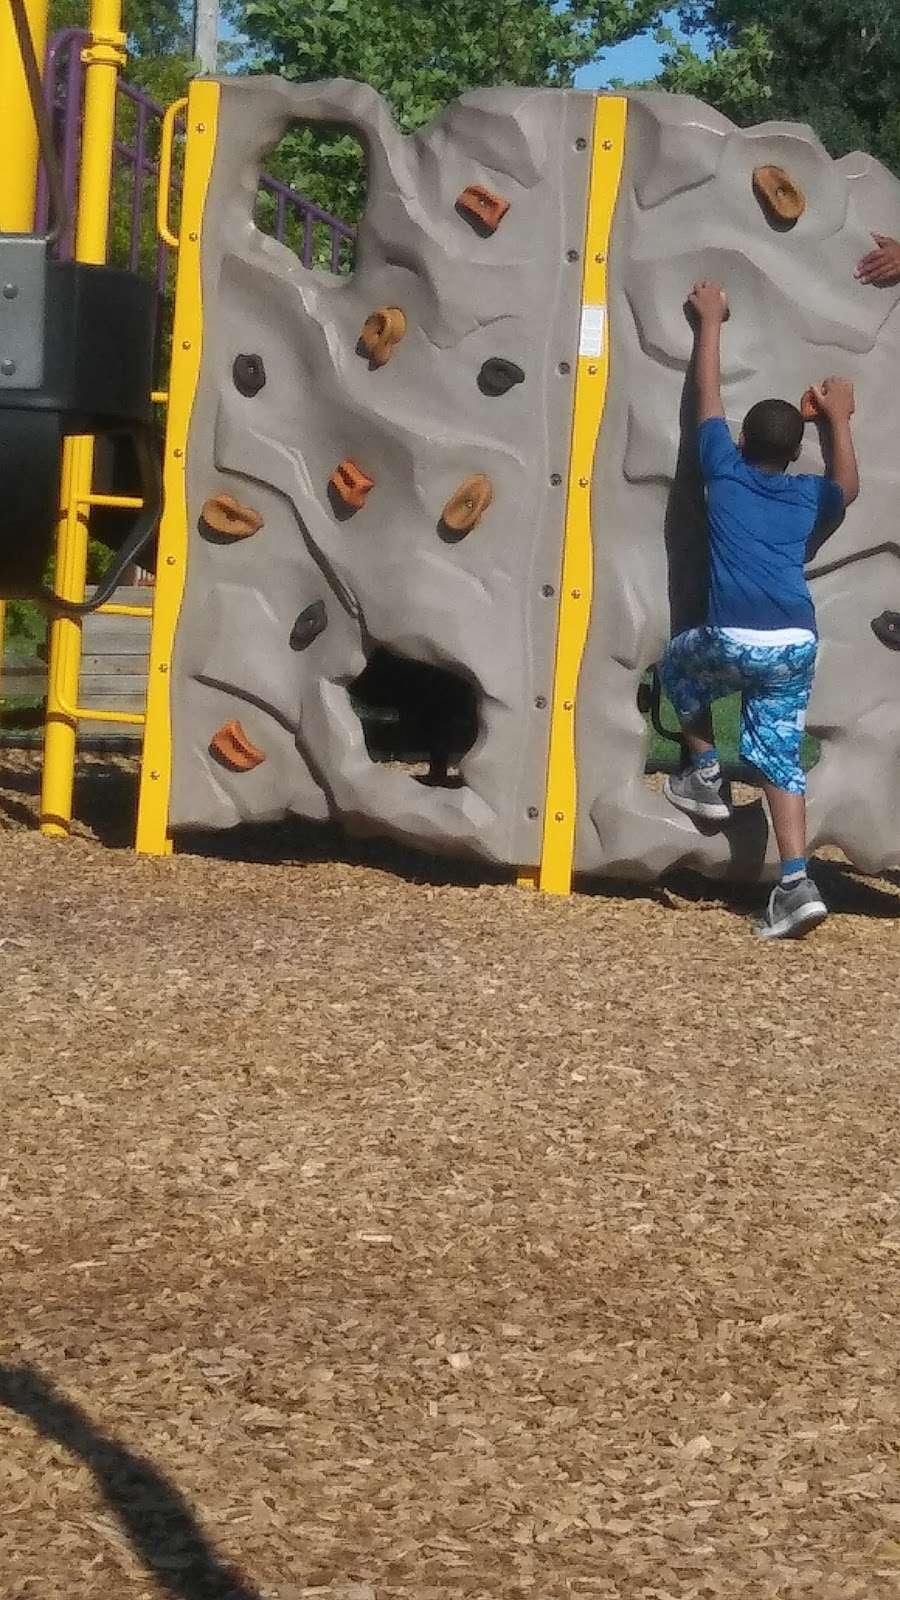 Heathwood Park - park  | Photo 5 of 10 | Address: 1021 Parallel Pkwy, Kansas City, KS 66104, USA | Phone: (913) 573-5000